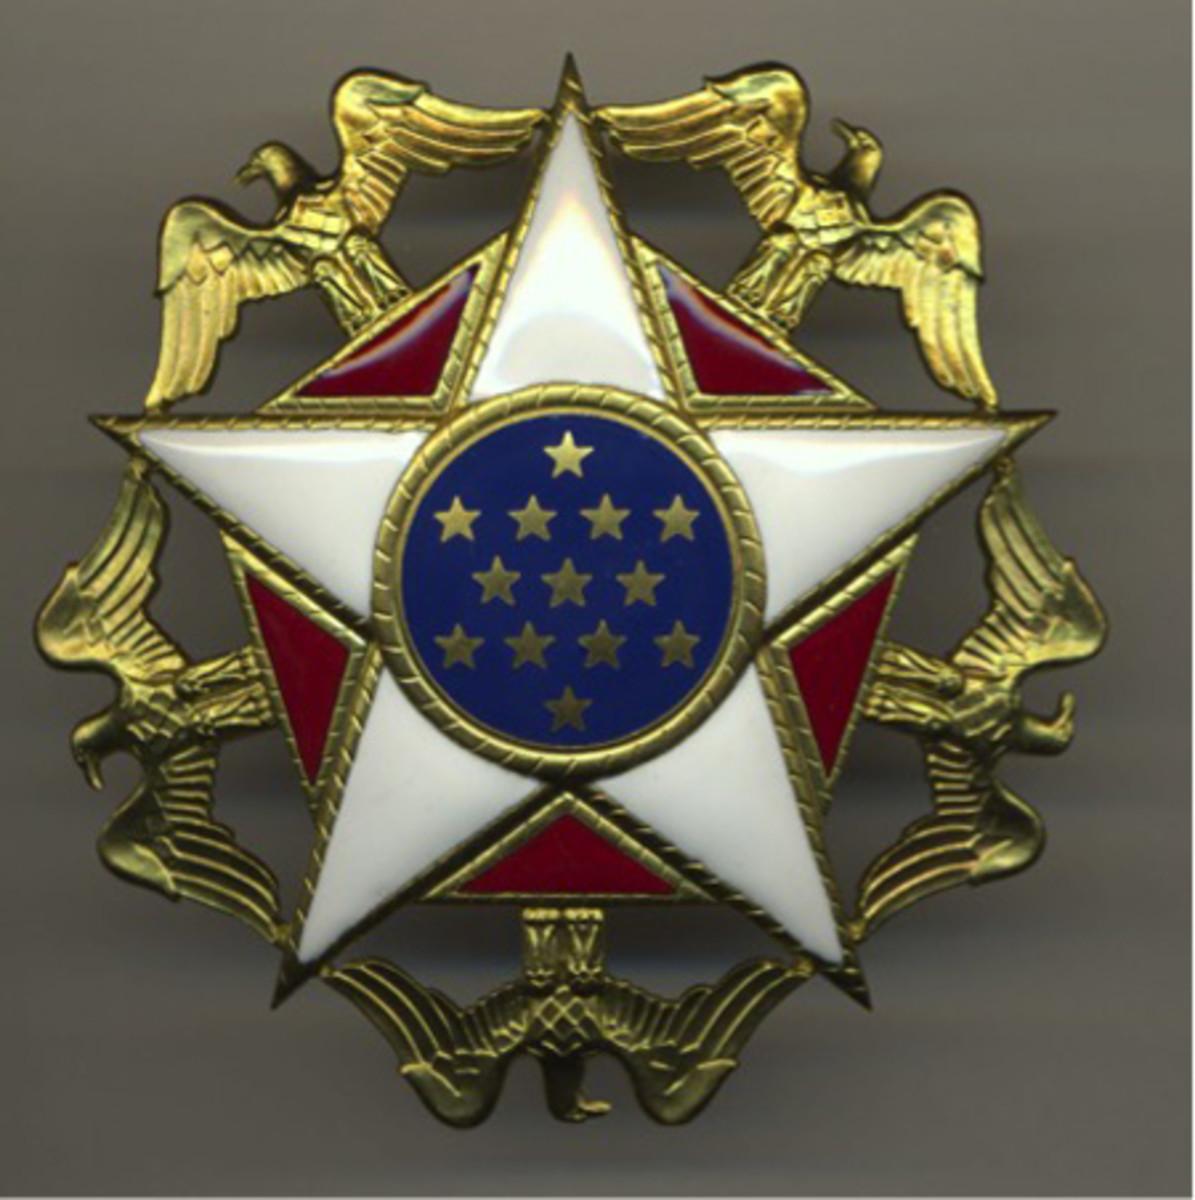 USA - Joe Dimaggio's 1977 Presidential Medal of Freedom